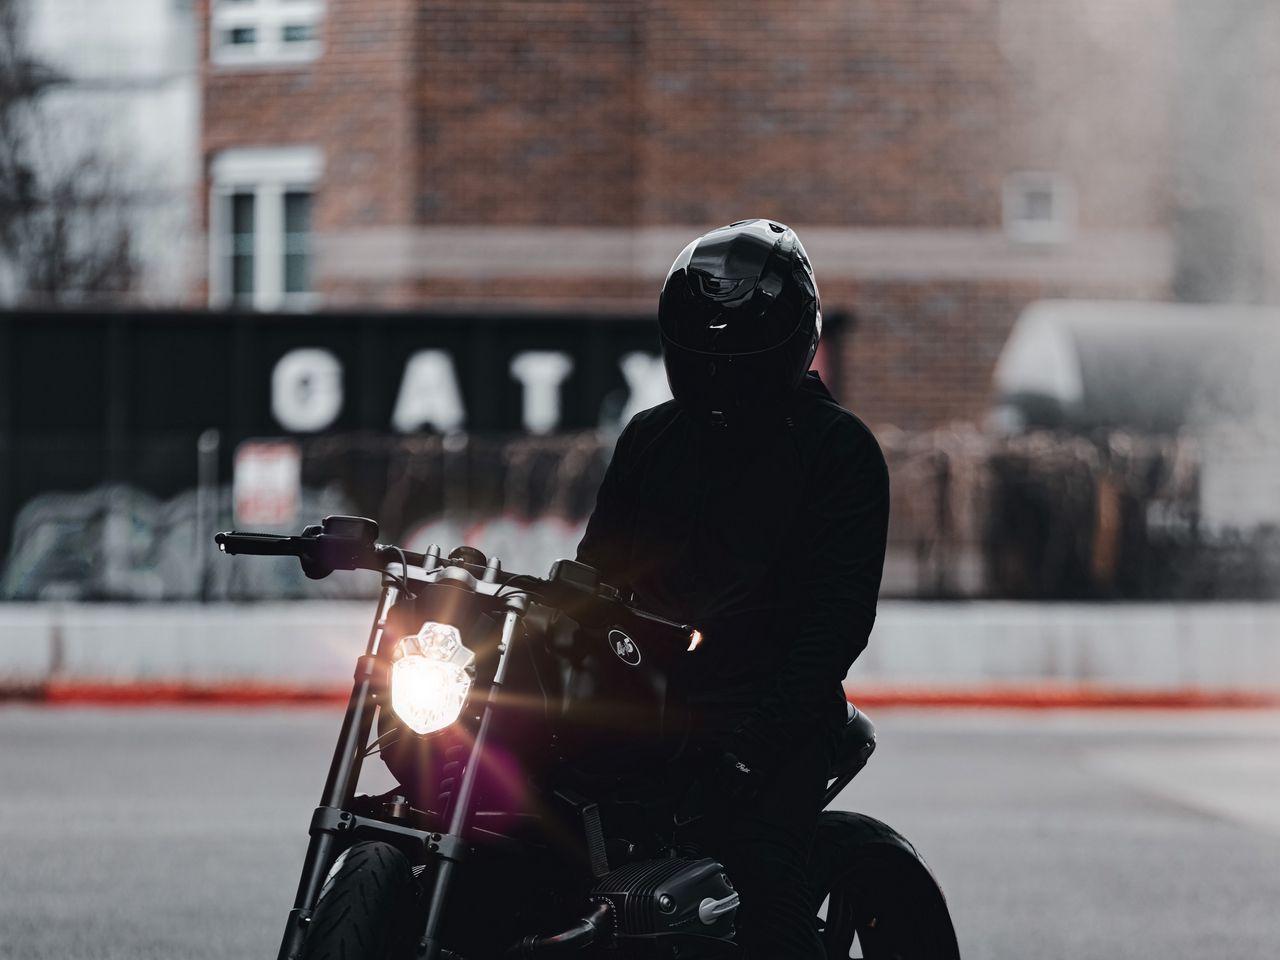 1280x960 Обои мотоцикл, байк, мотоциклист, черный, свет, дорога